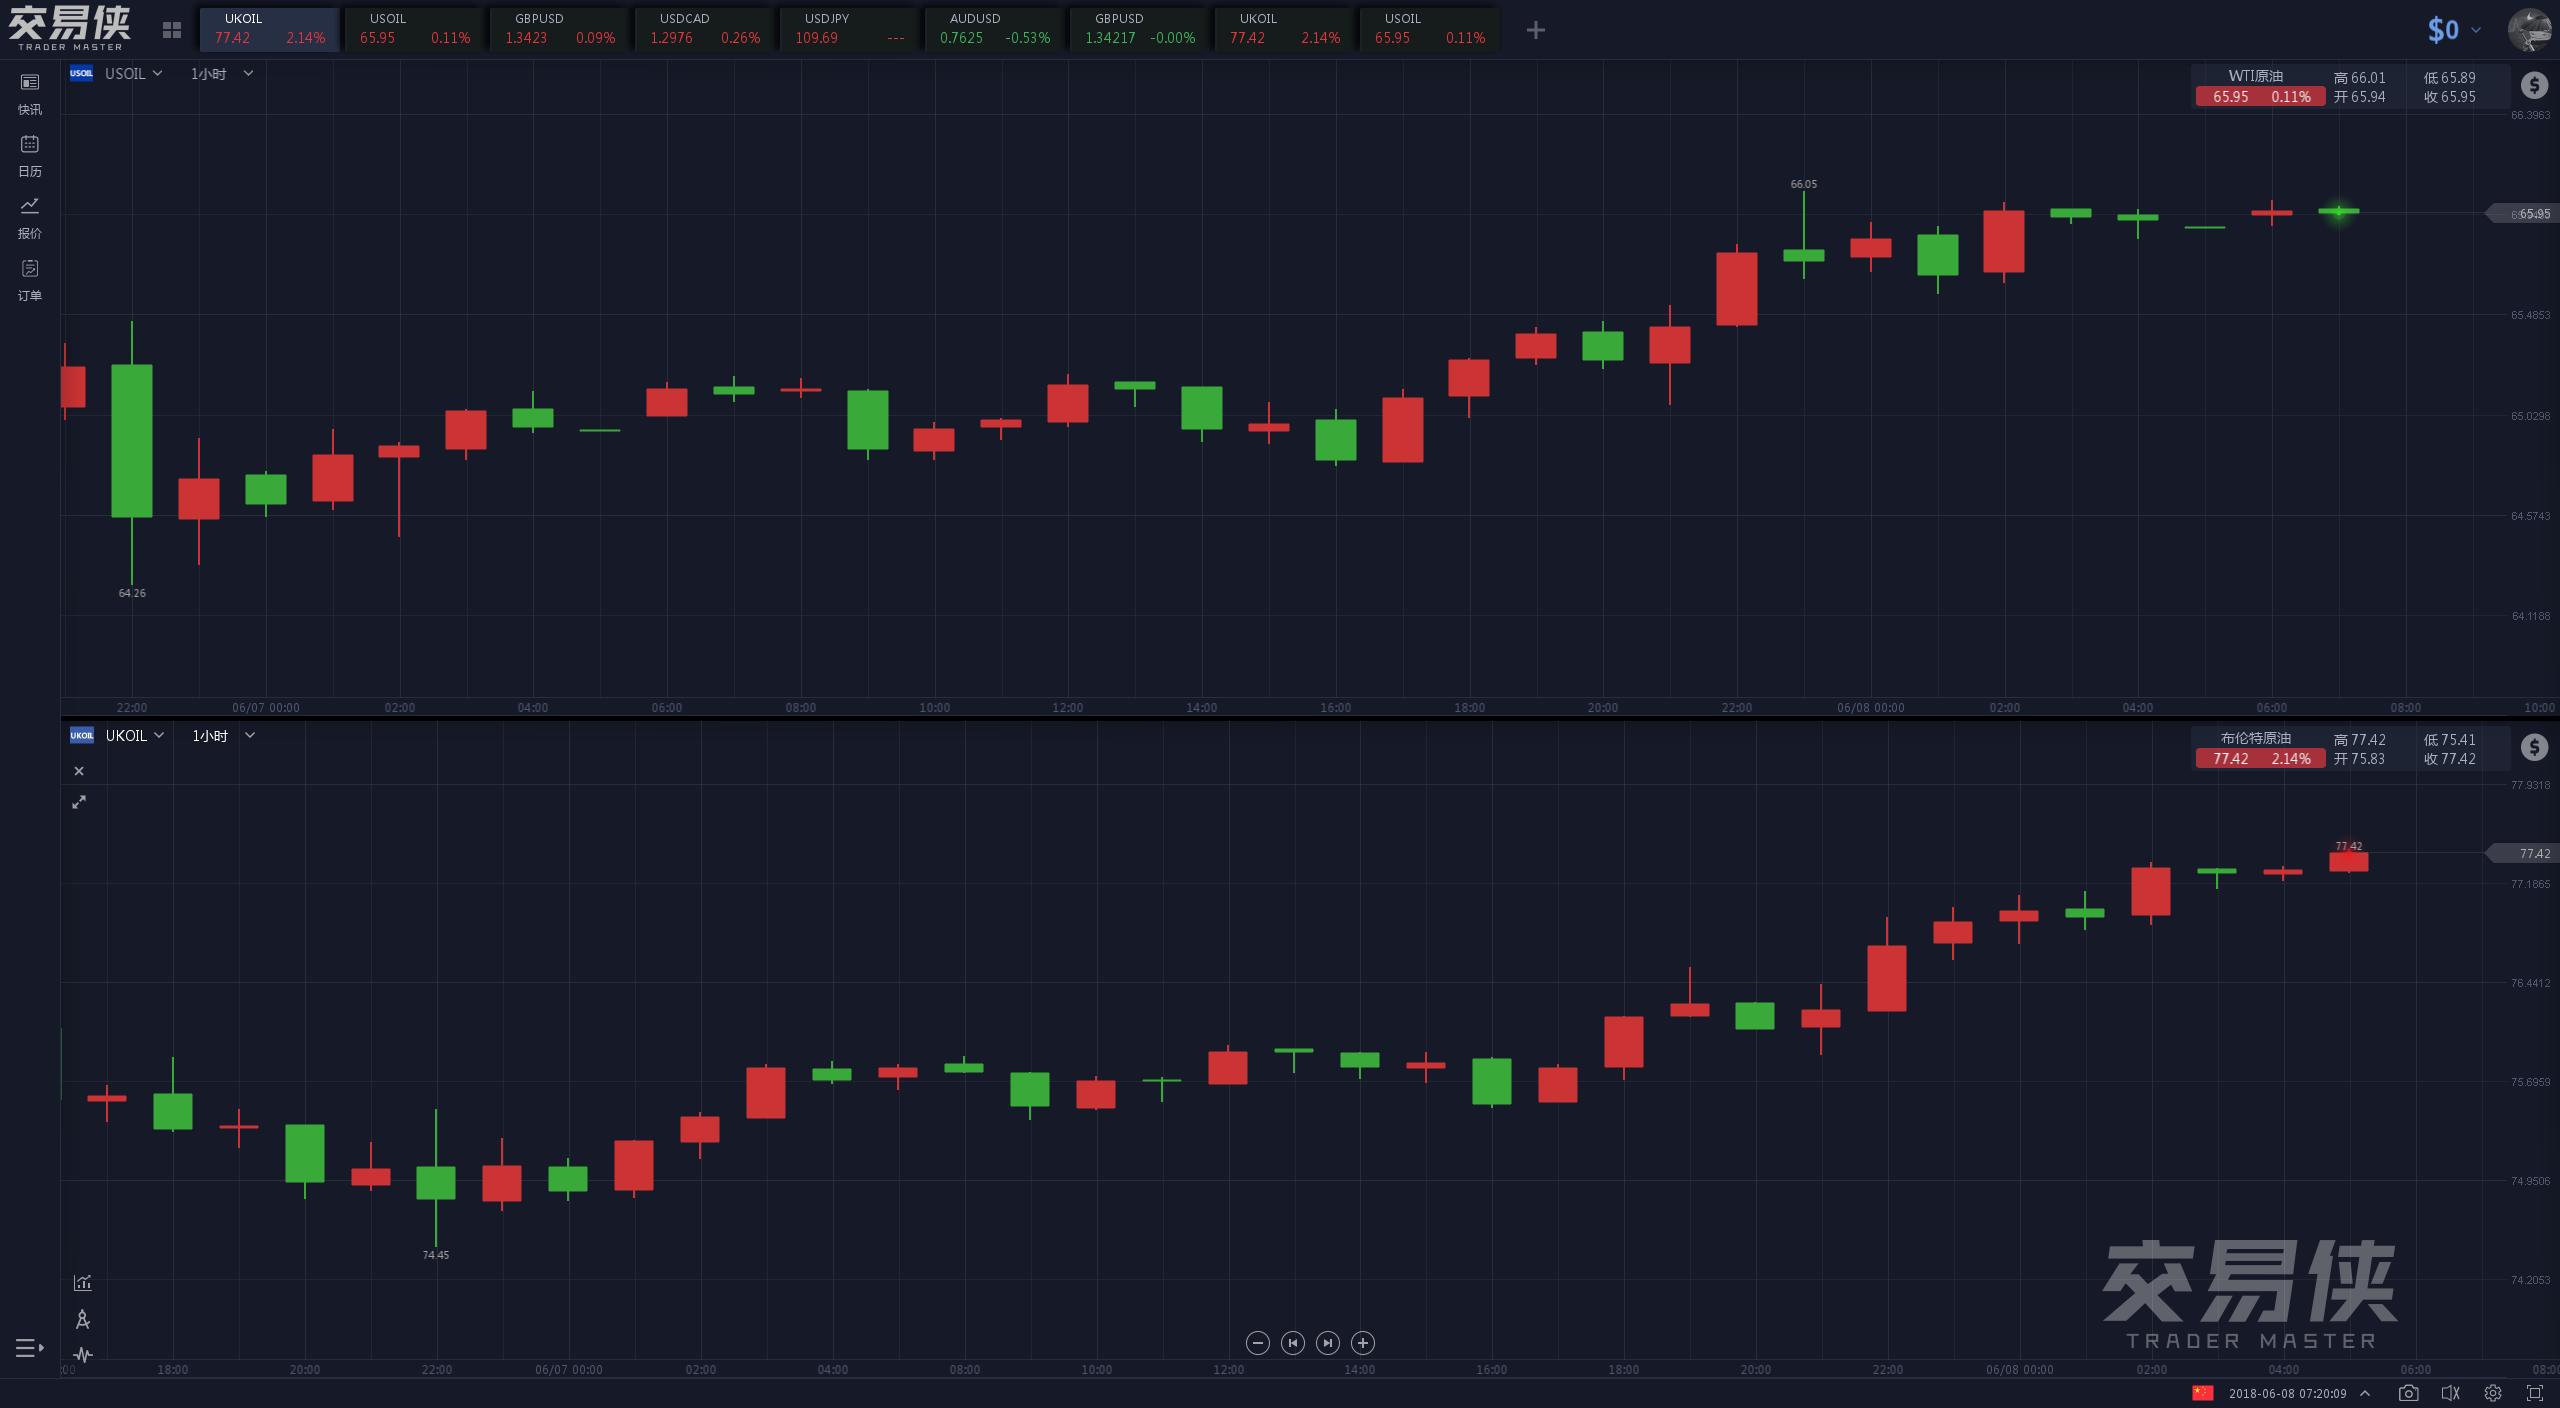 G7峰会影响黄金价格暴涨暴跌上演倒V行情